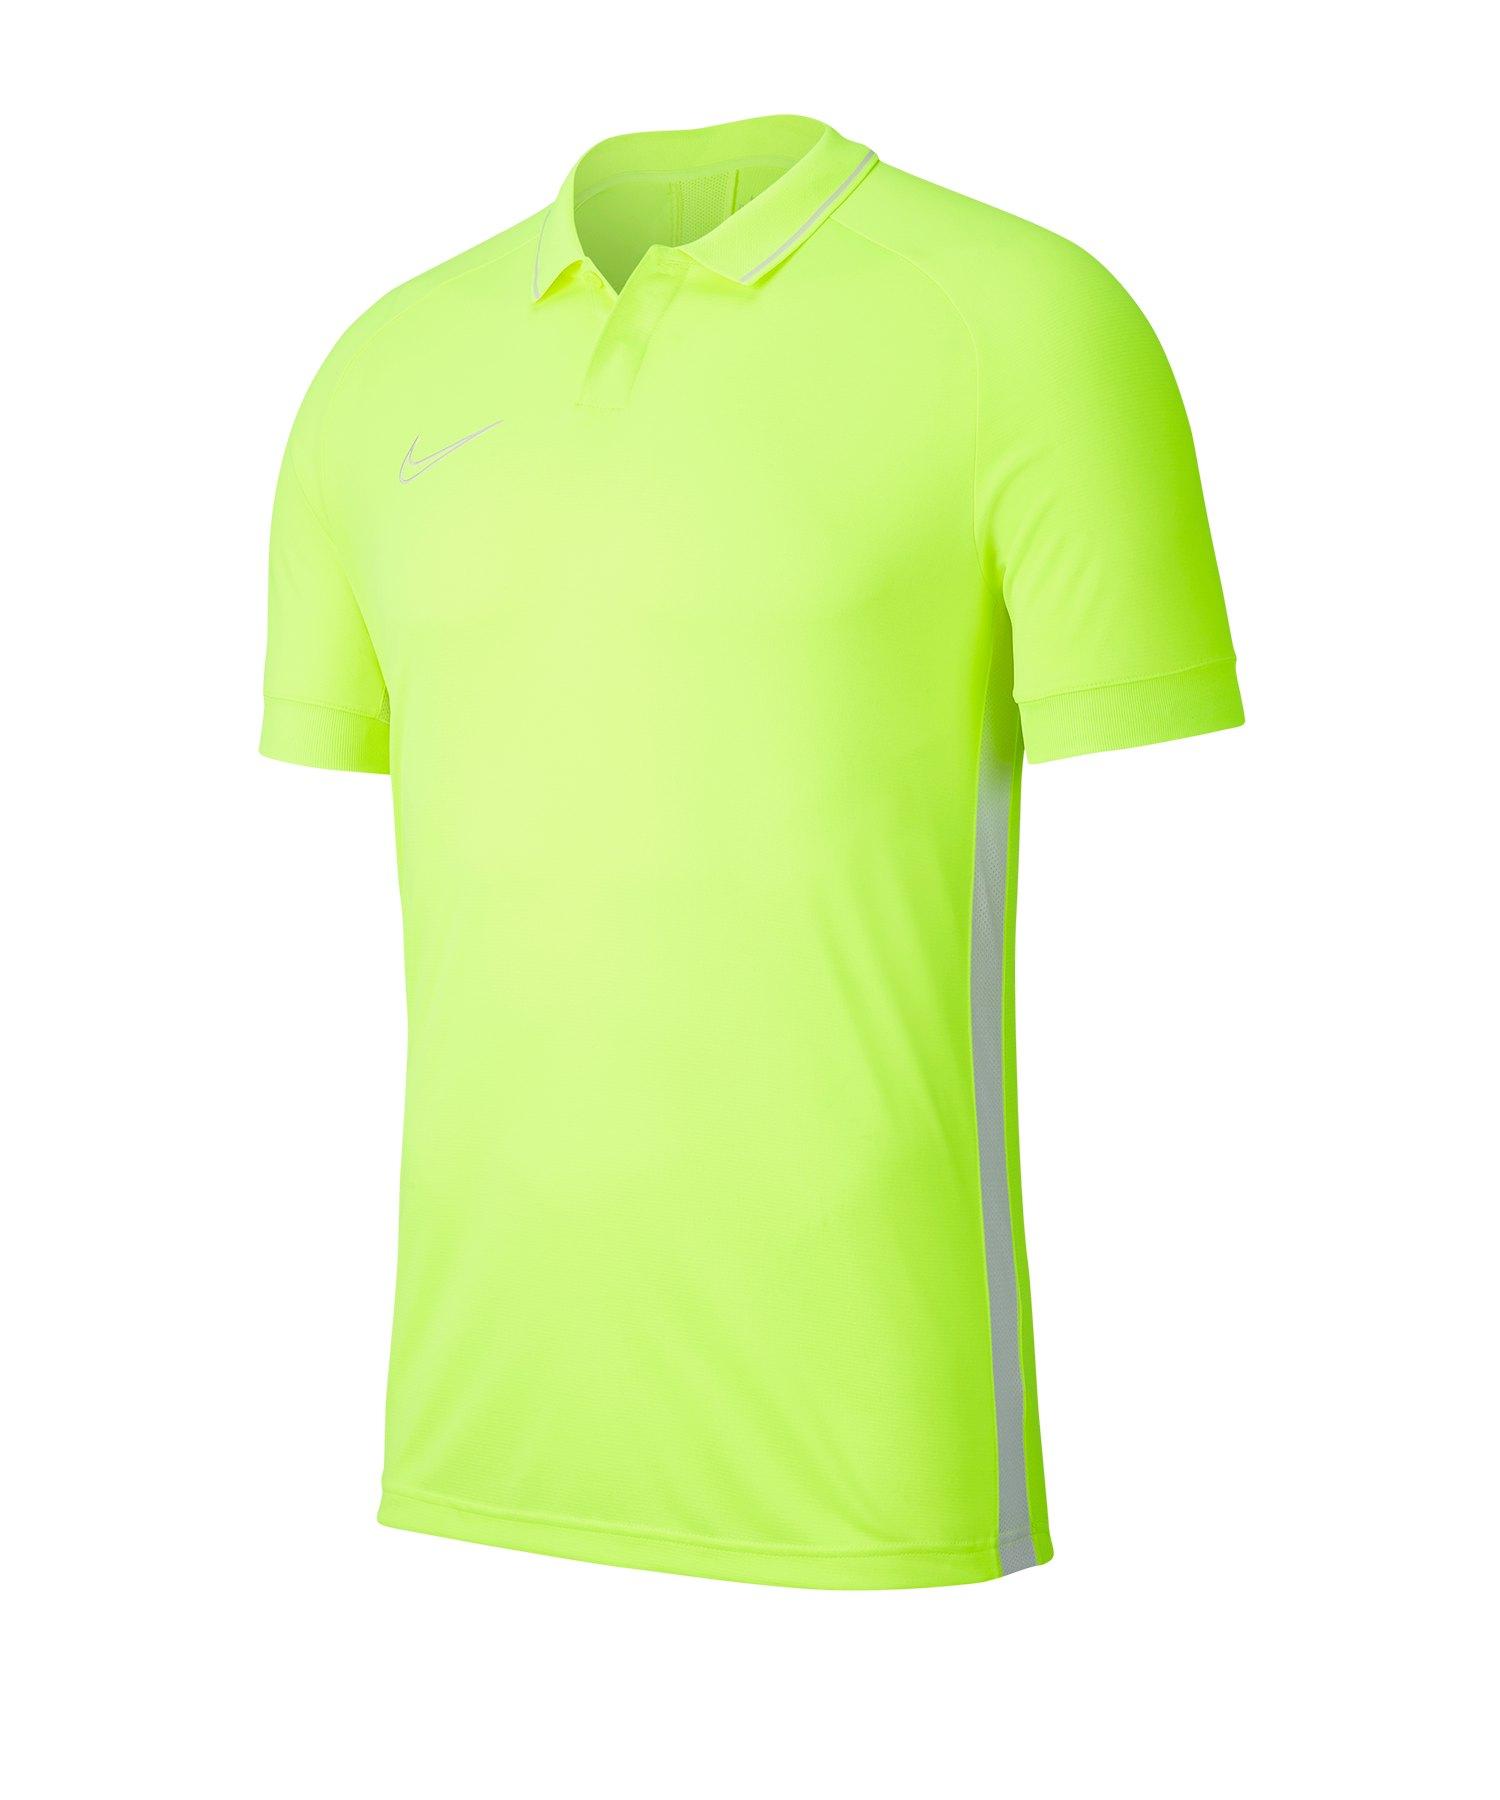 Nike Academy 19 Poloshirt Kids Gelb F702 - gelb